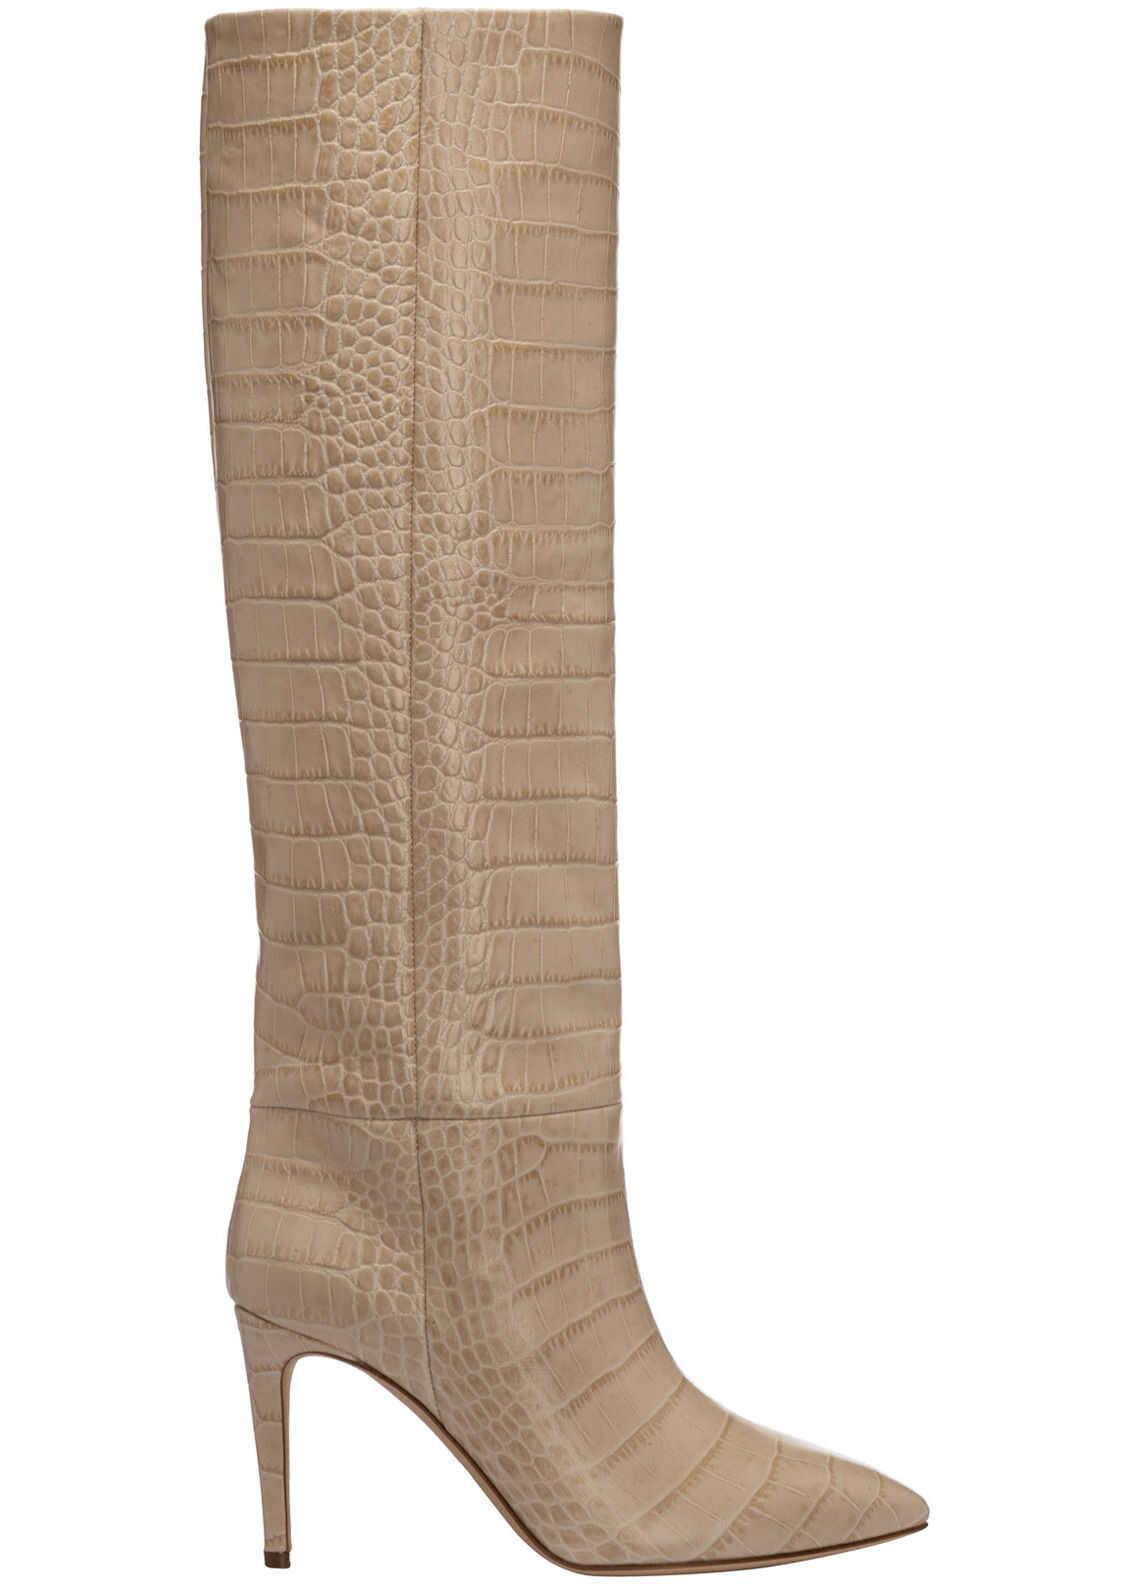 Paris Texas Heel Boots PX548 Beige imagine b-mall.ro